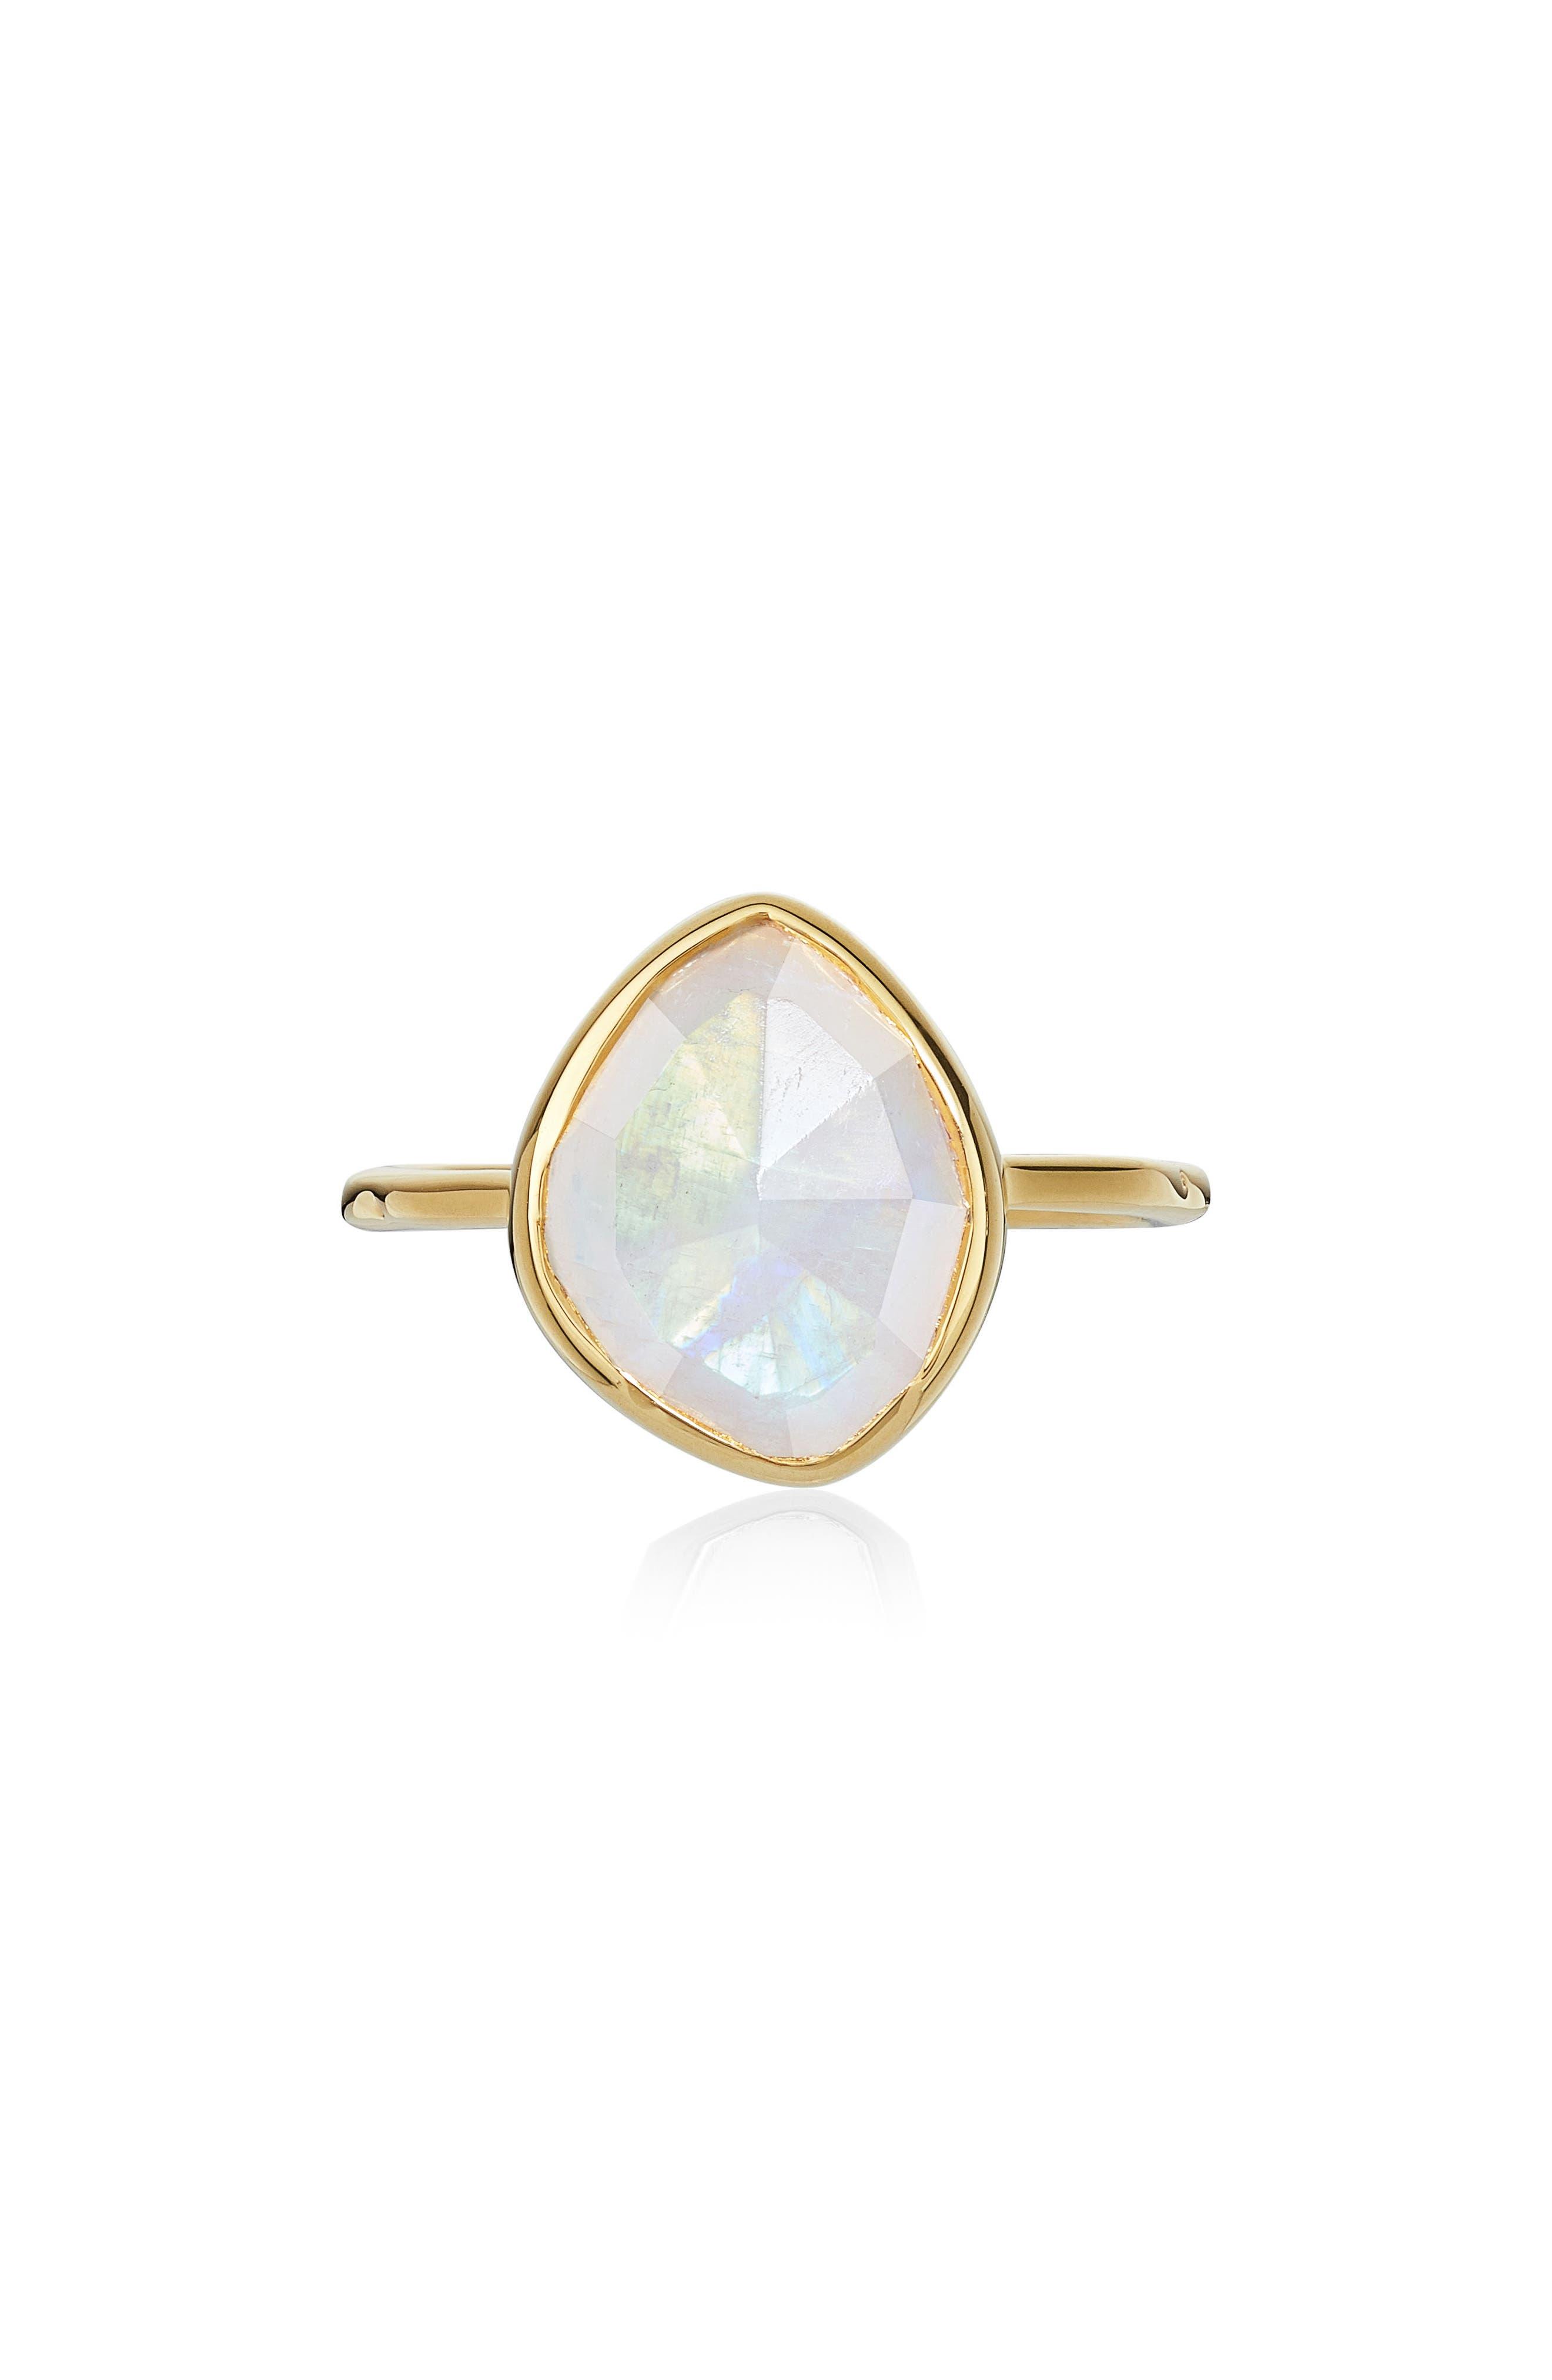 Siren Small Nugget Stacking Ring,                             Main thumbnail 1, color,                             YELLOW GOLD/ MOONSTONE